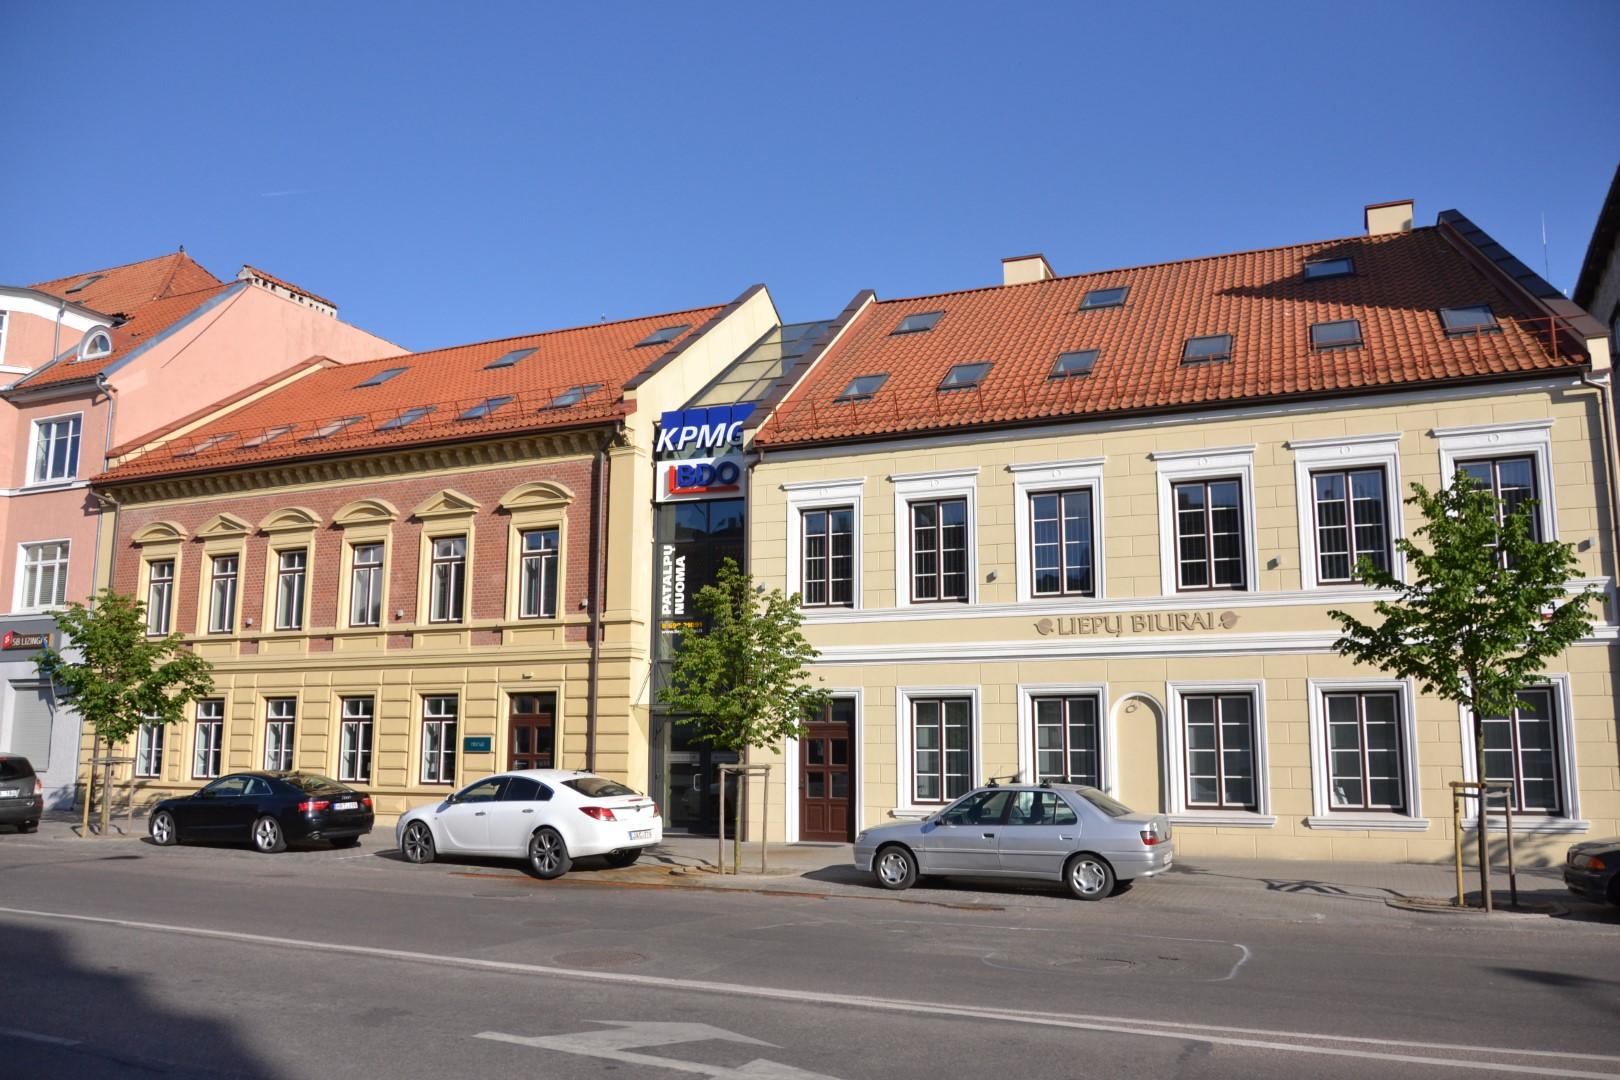 Liepų g. fasadas 1